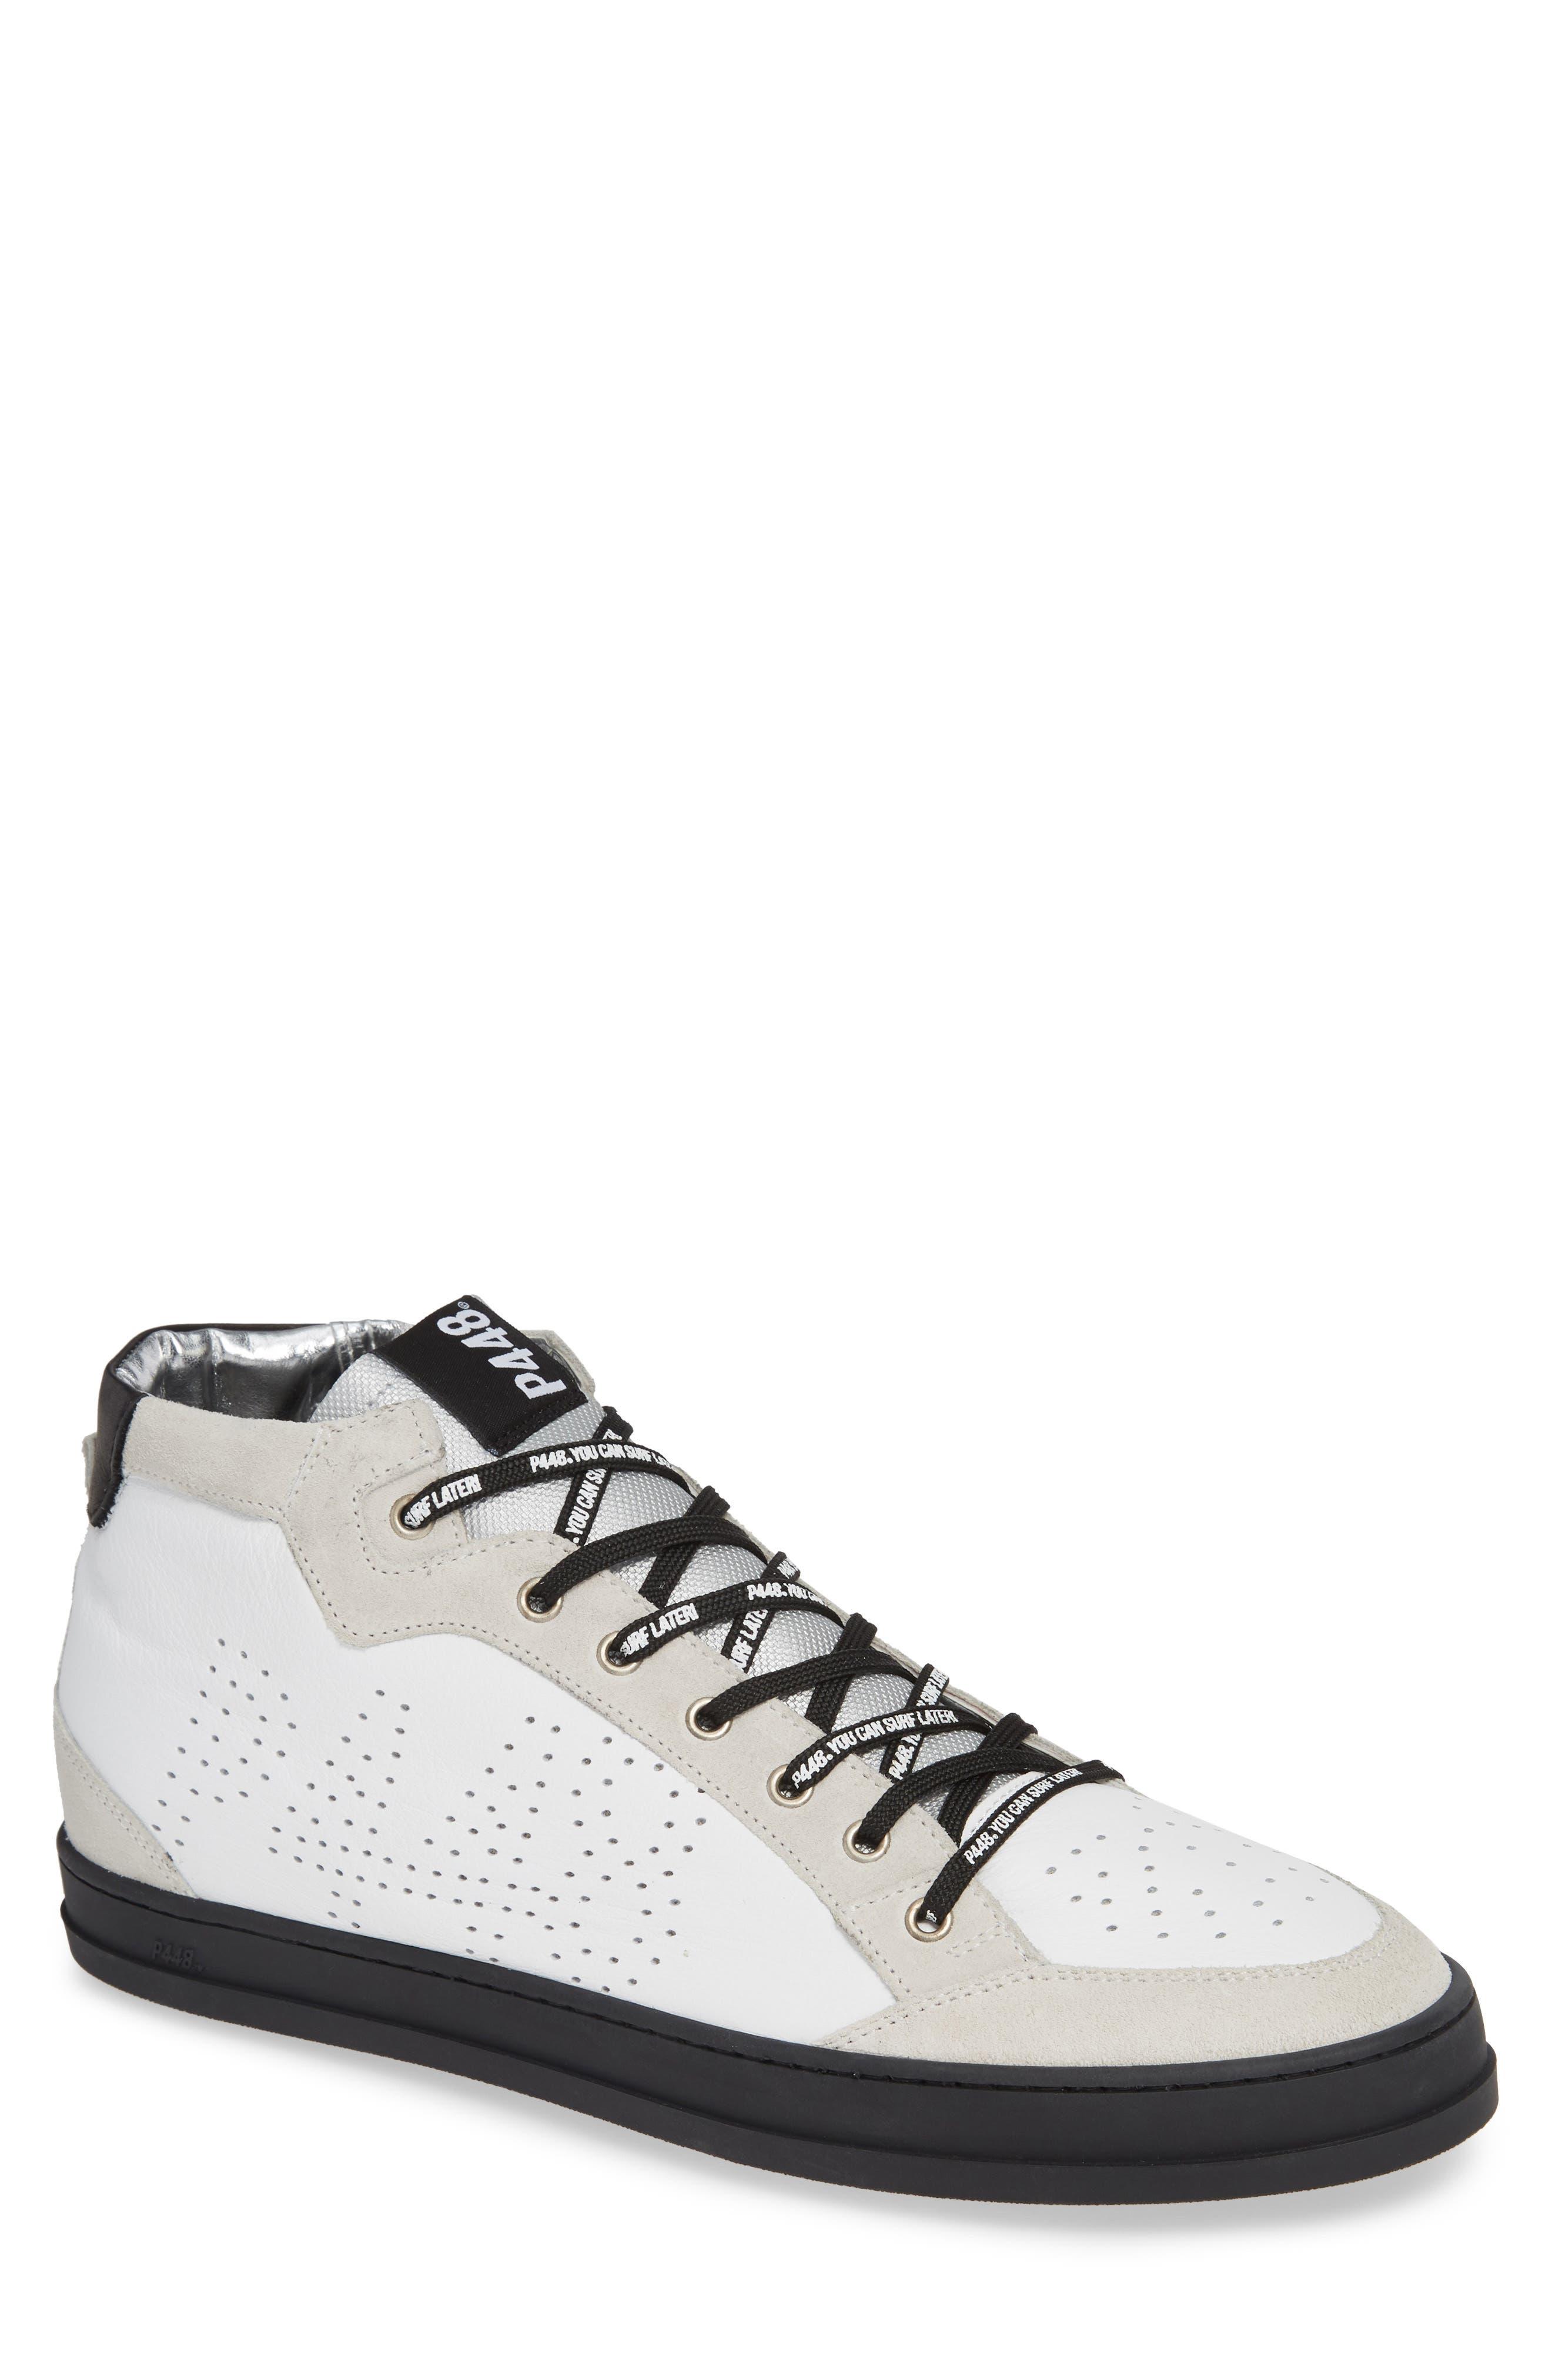 A8Love Mid Top Sneaker,                             Main thumbnail 1, color,                             WHITE/ BLACK